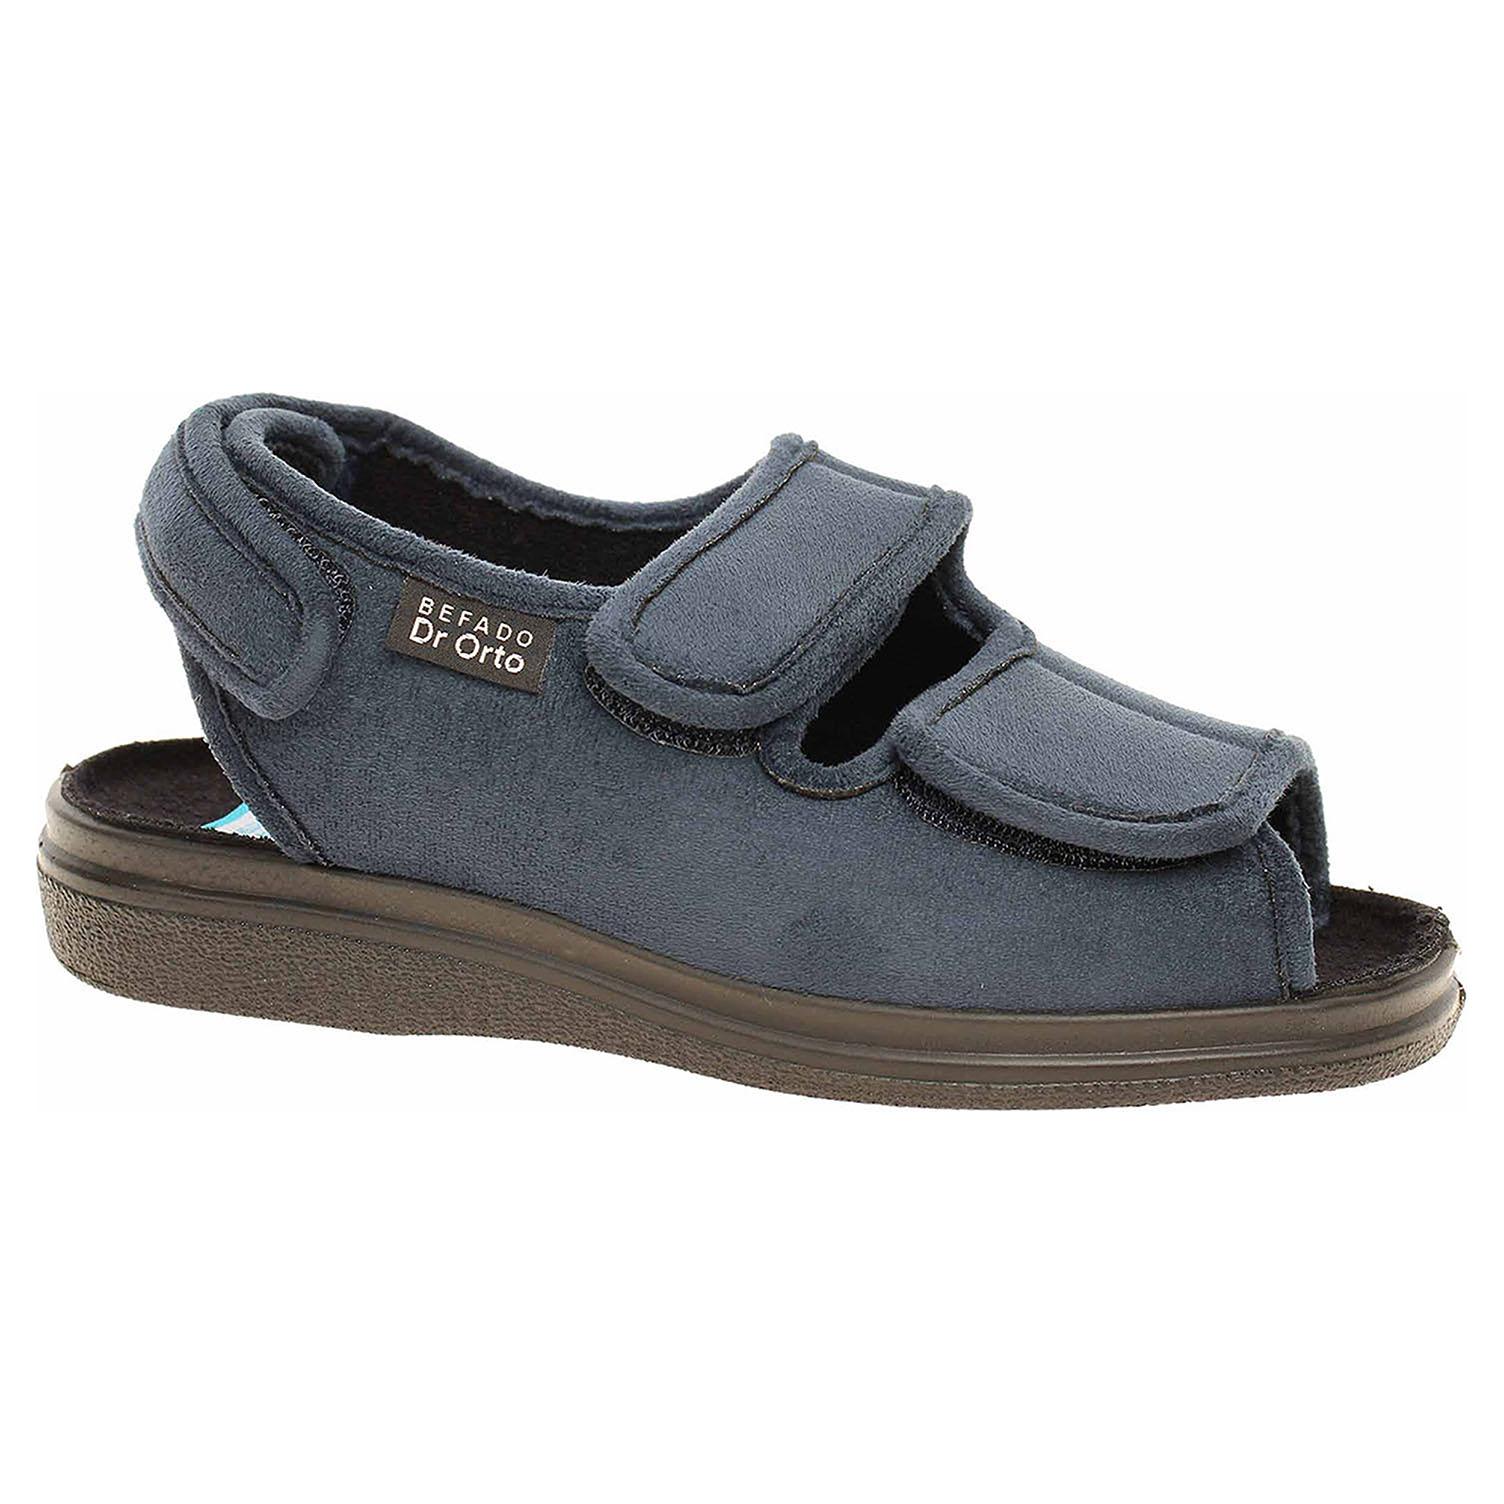 Domácí obuv Befado 676D003 modrá 676D003 39